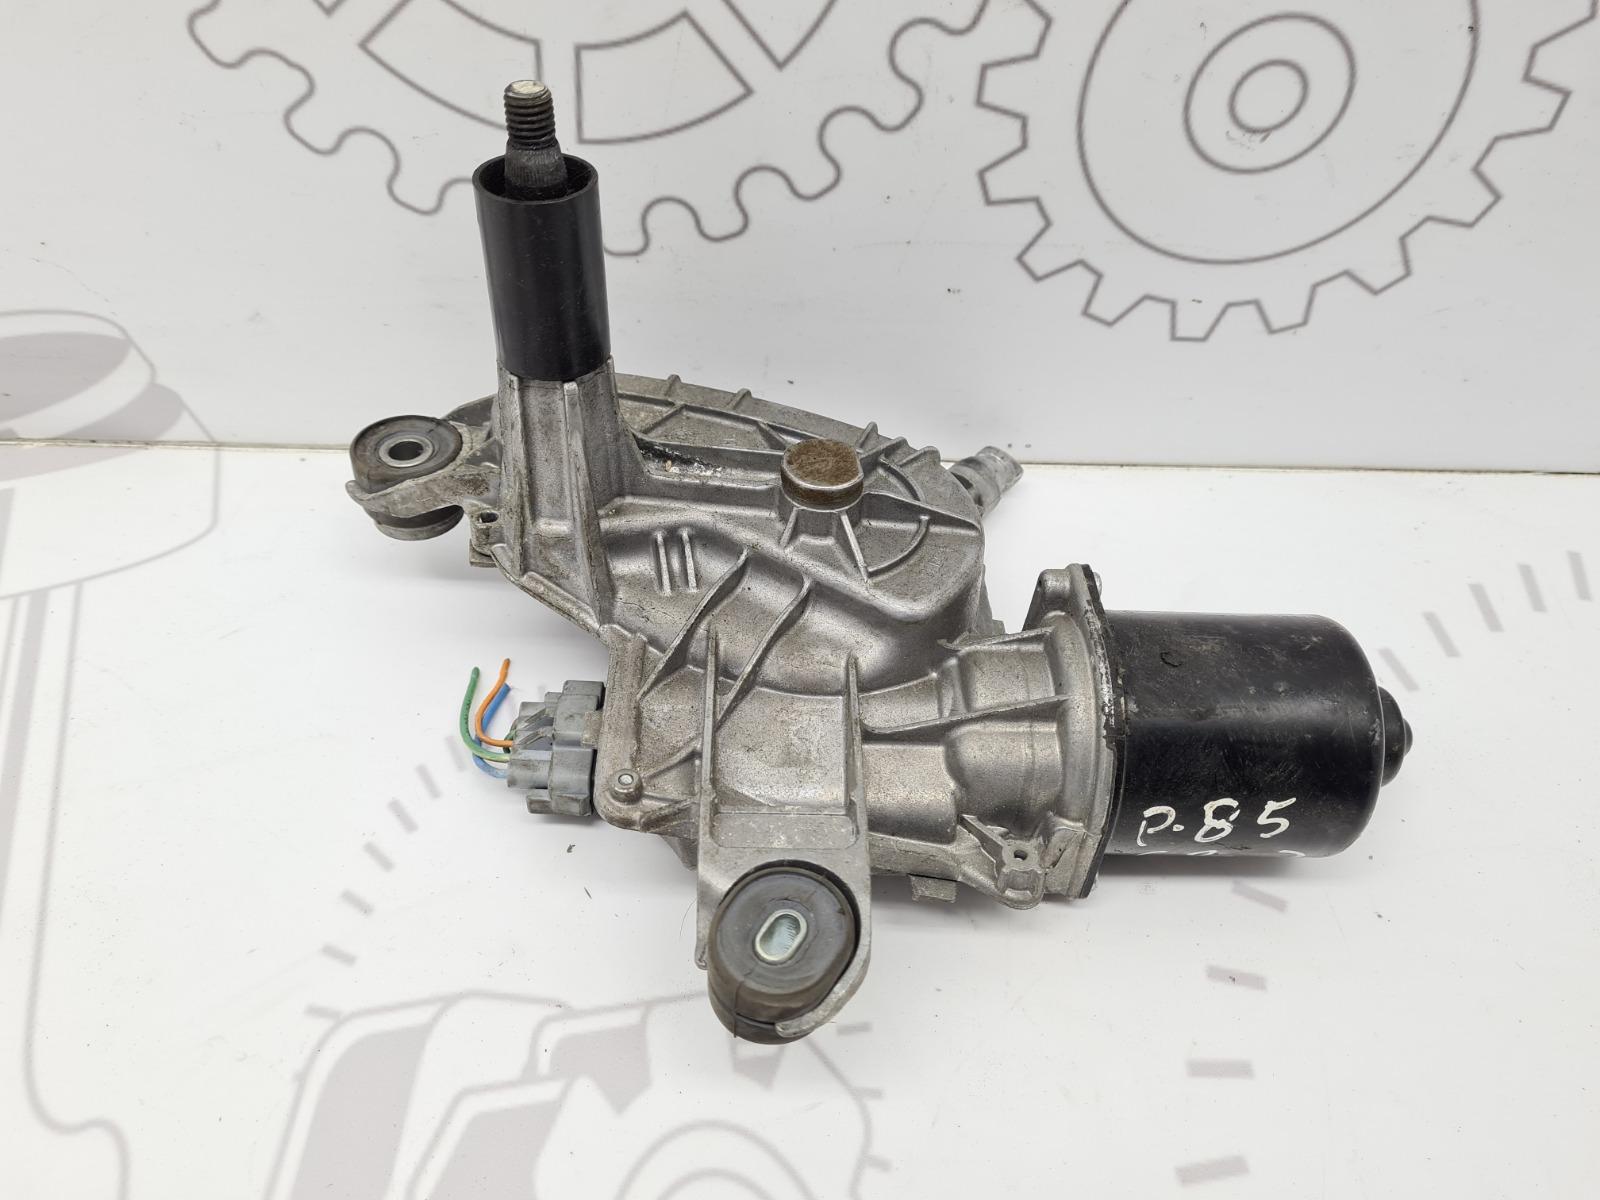 Моторчик передних стеклоочистителей (дворников) Citroen C4 Grand Picasso 1.6 HDI 2009 (б/у)